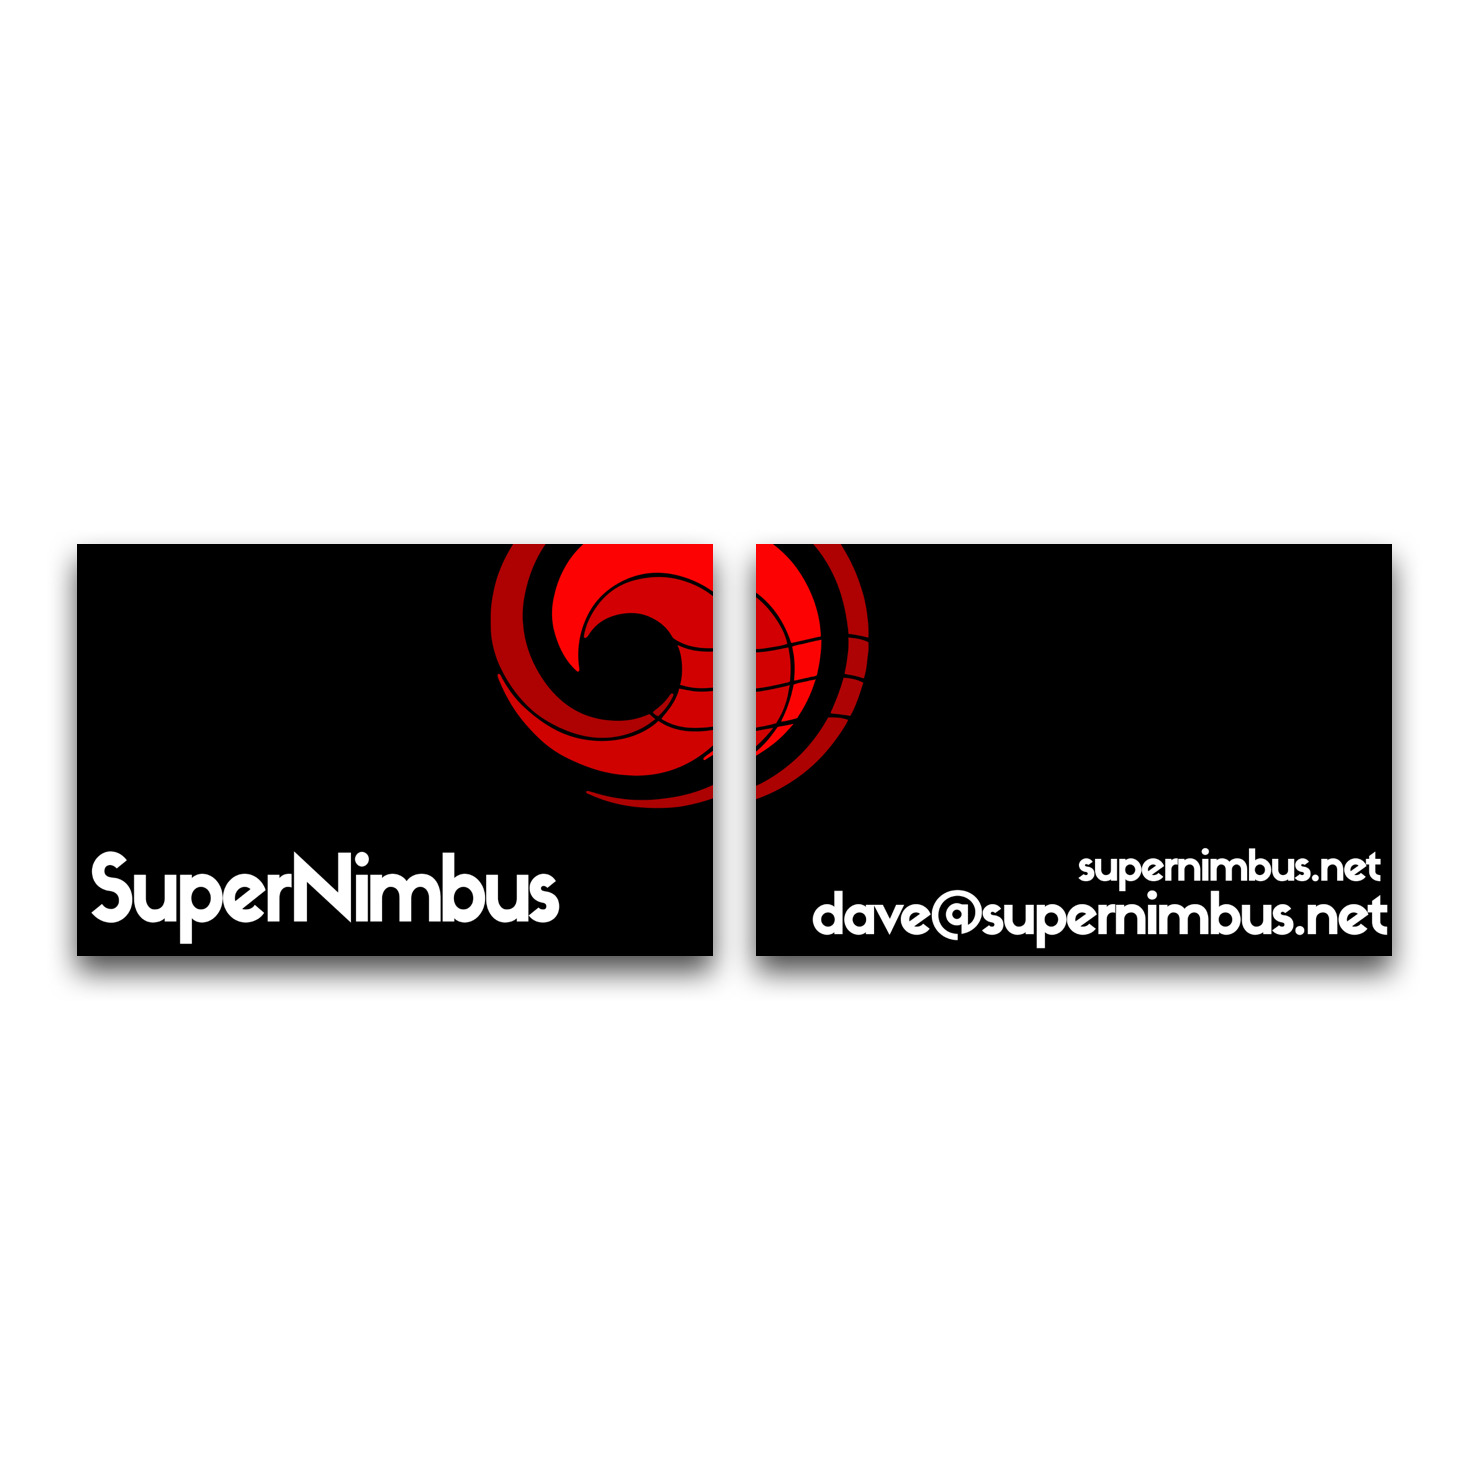 SuperNimbus Business card design mockup